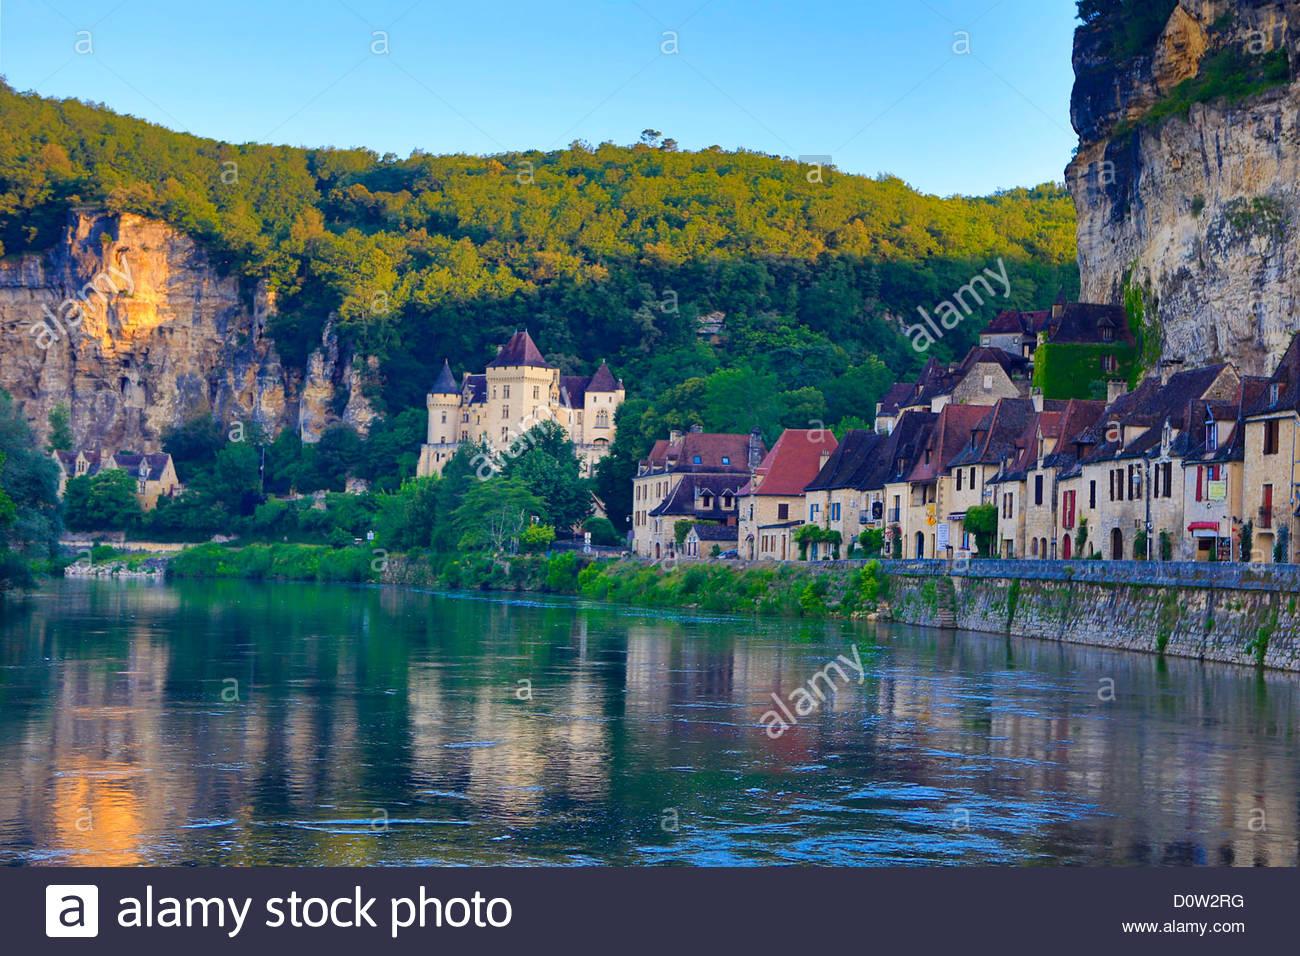 France, Europe, Travel, Dordogne, La Roque Gageac, Malartie.